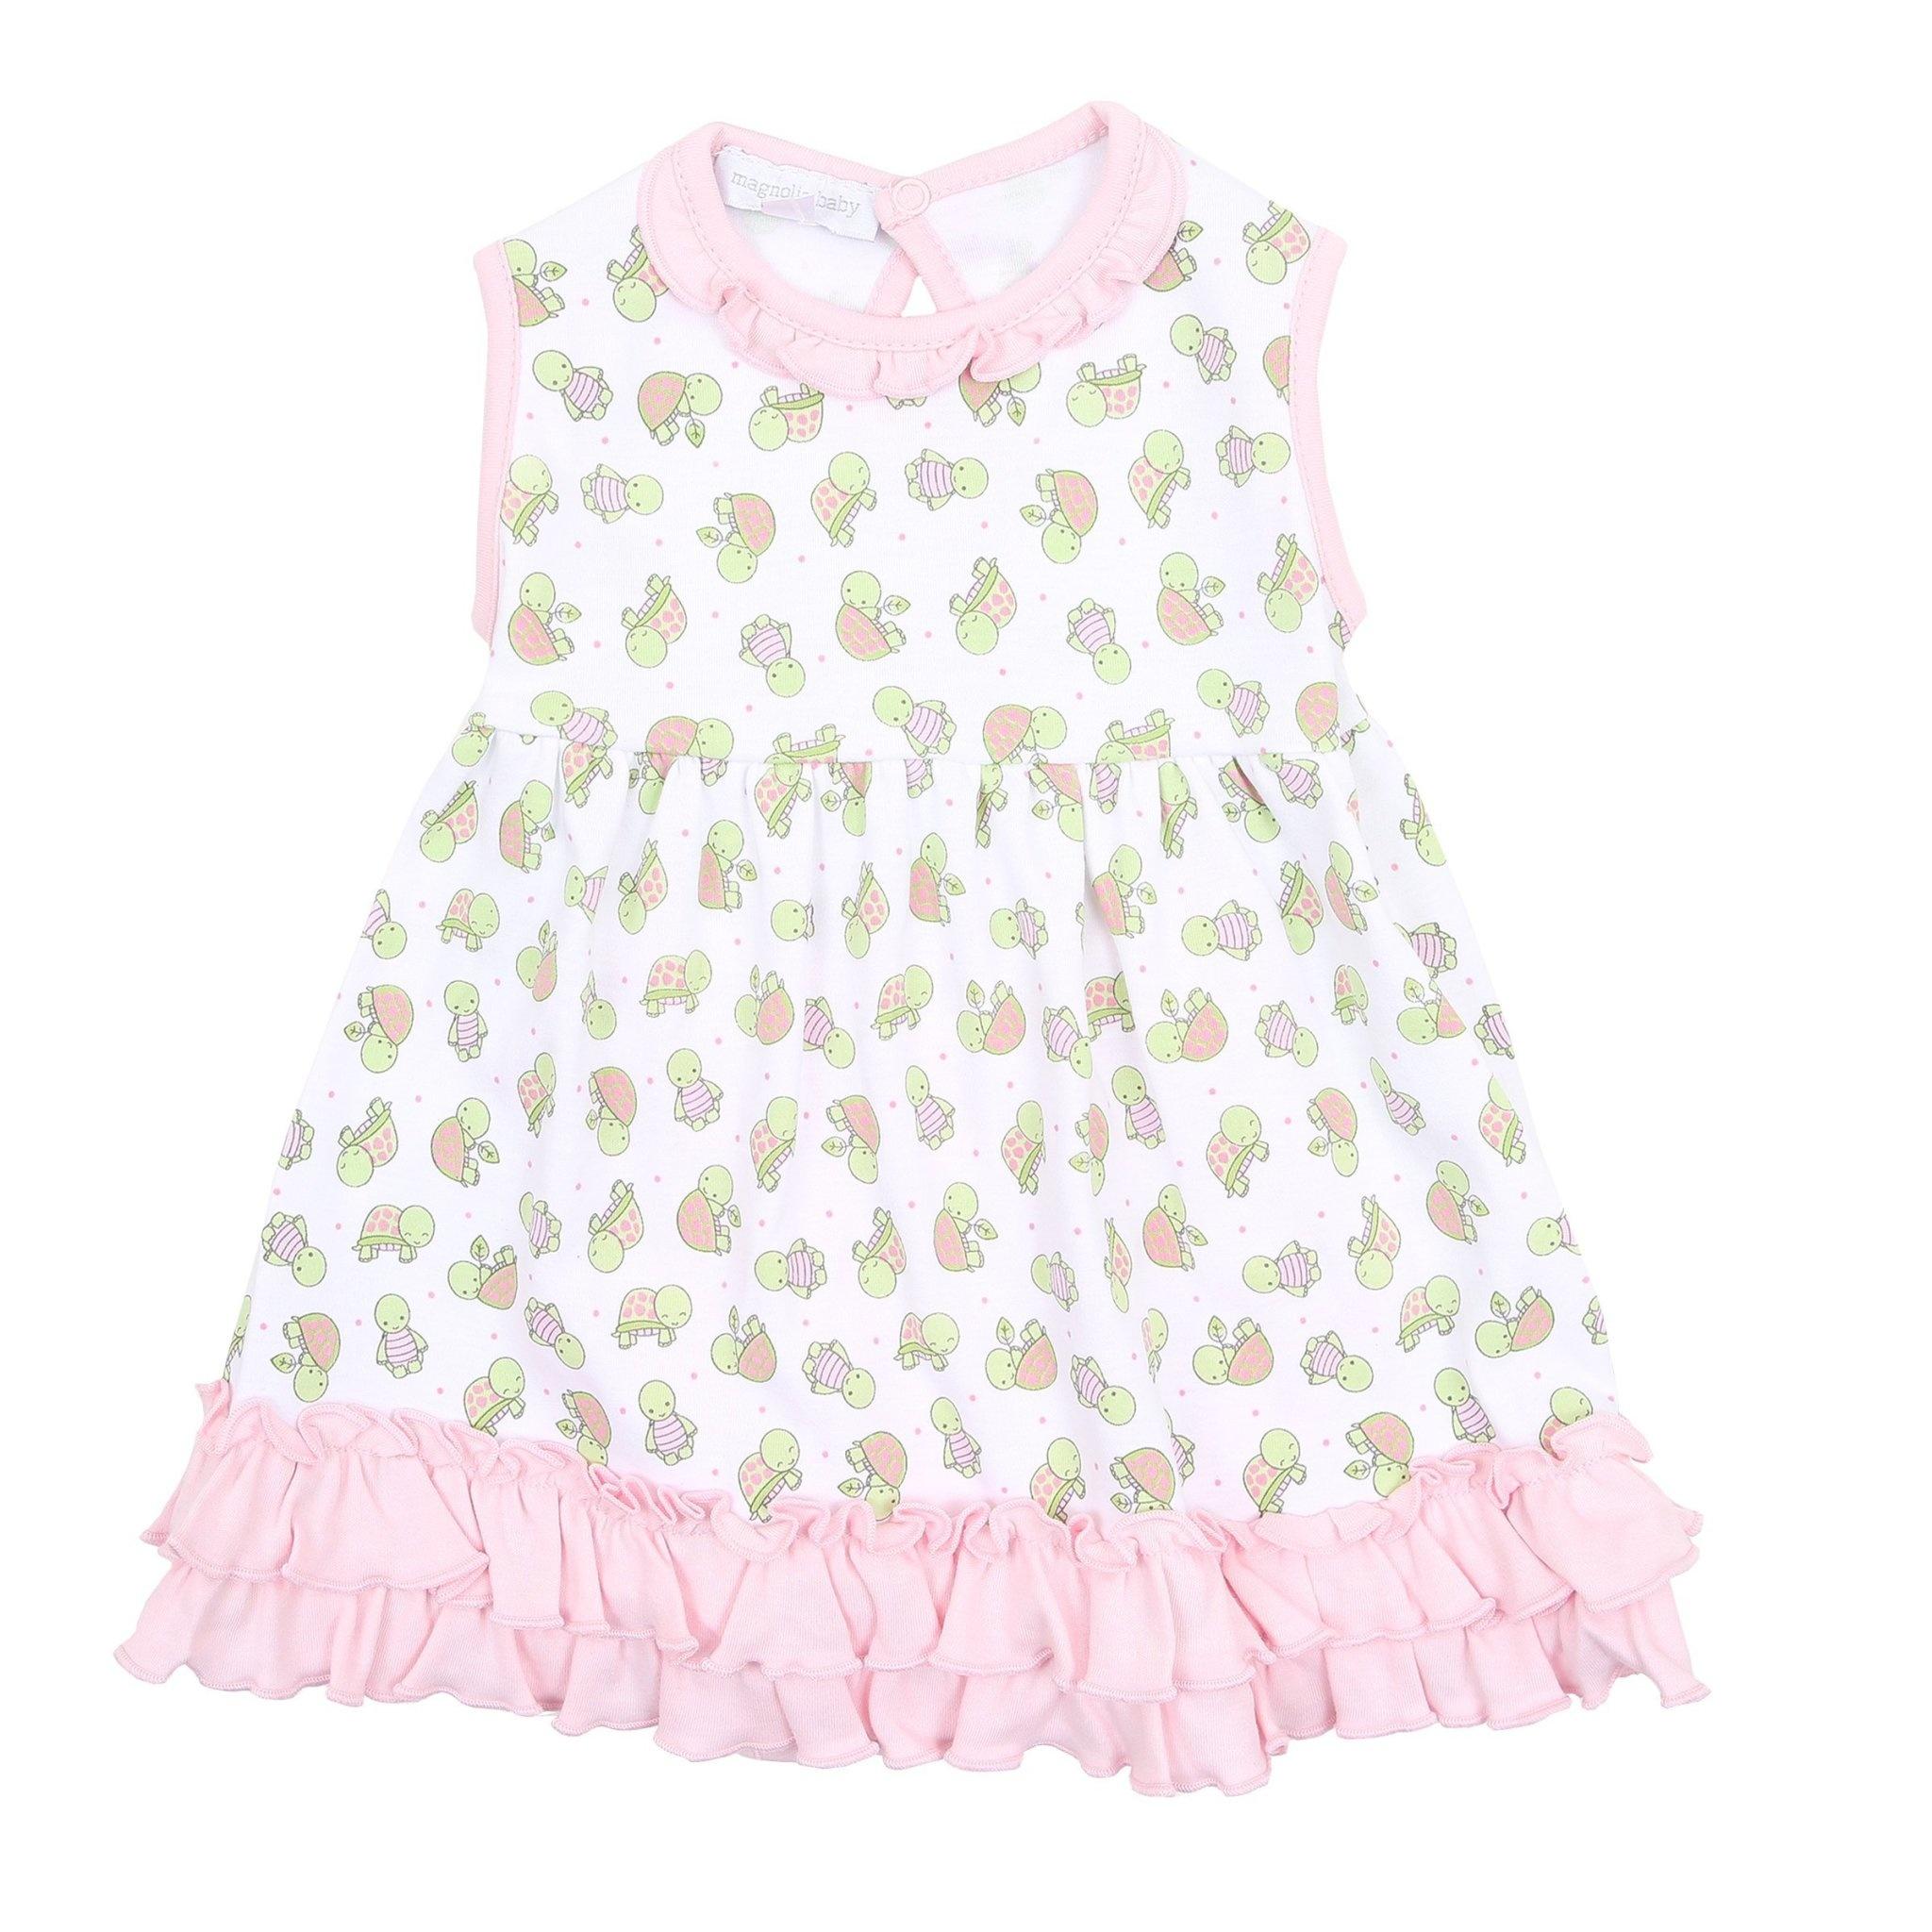 Magnolia Baby Magnolia Baby Happy Turtles Dress Set